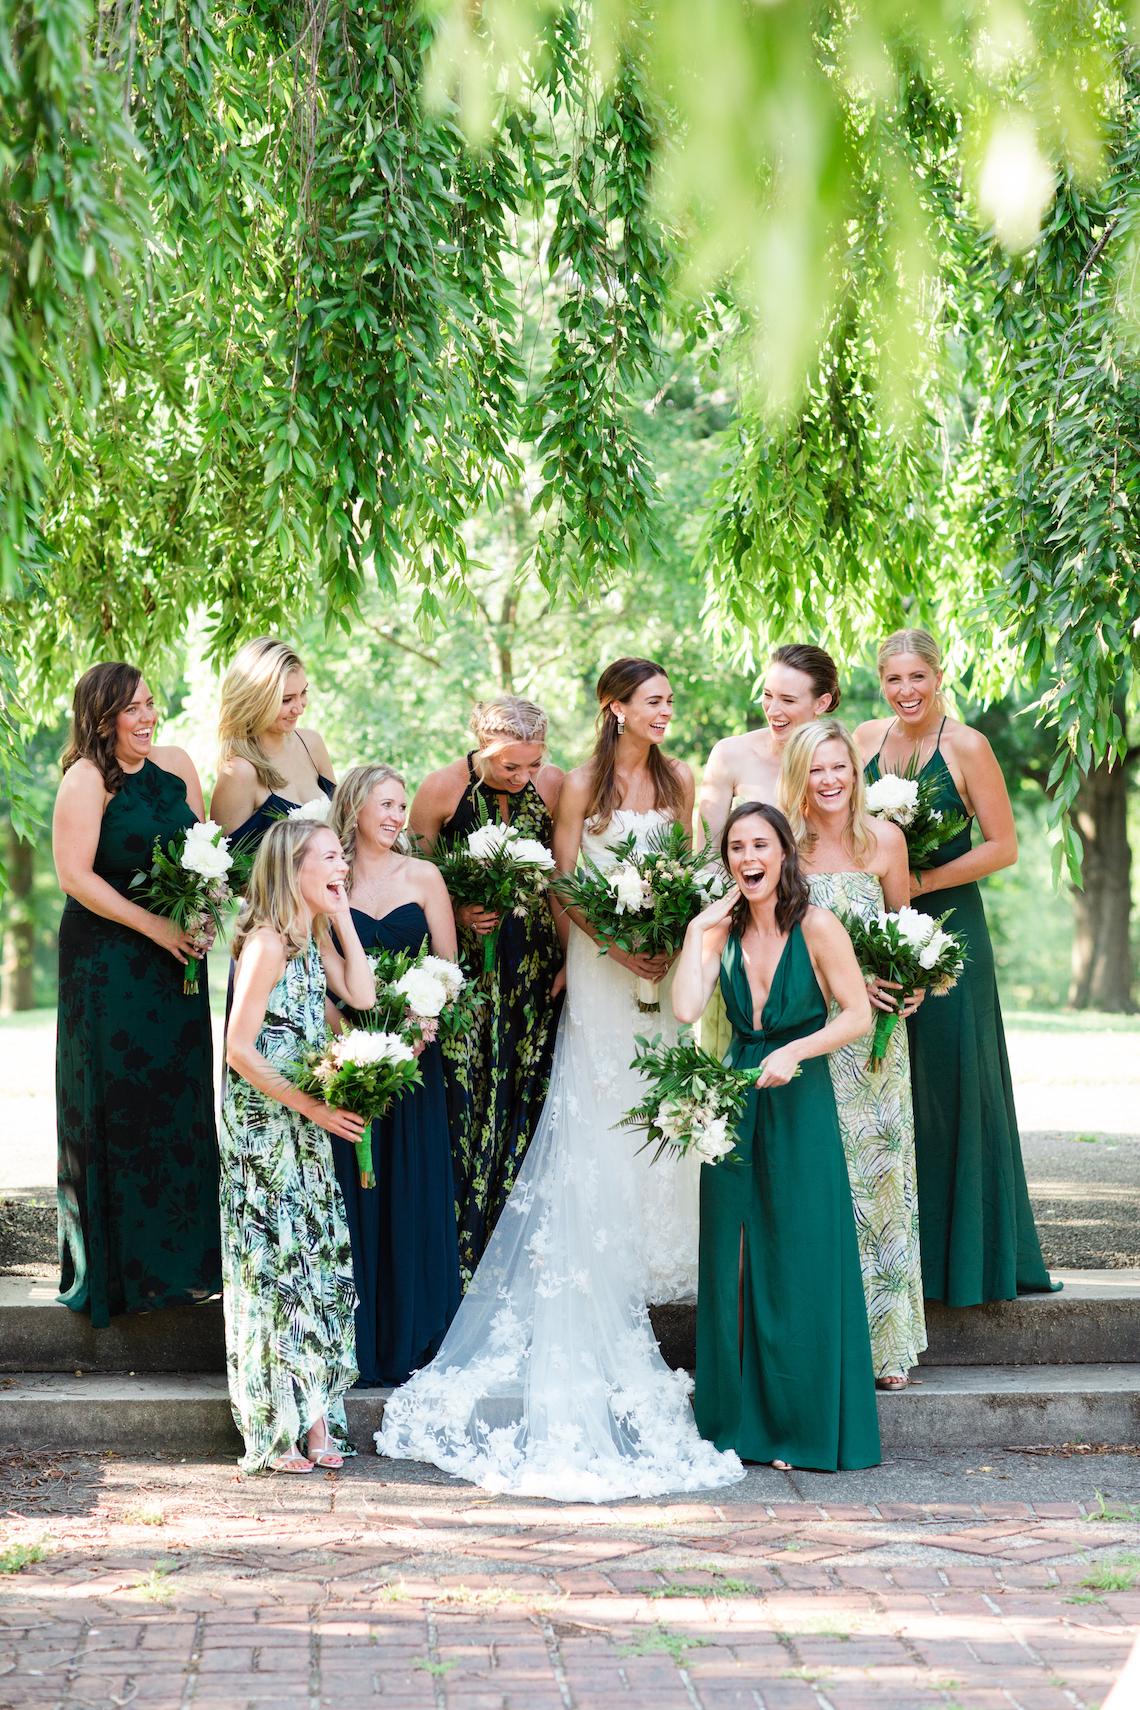 Jungle-Inspired Wedding by Asya Photography 21